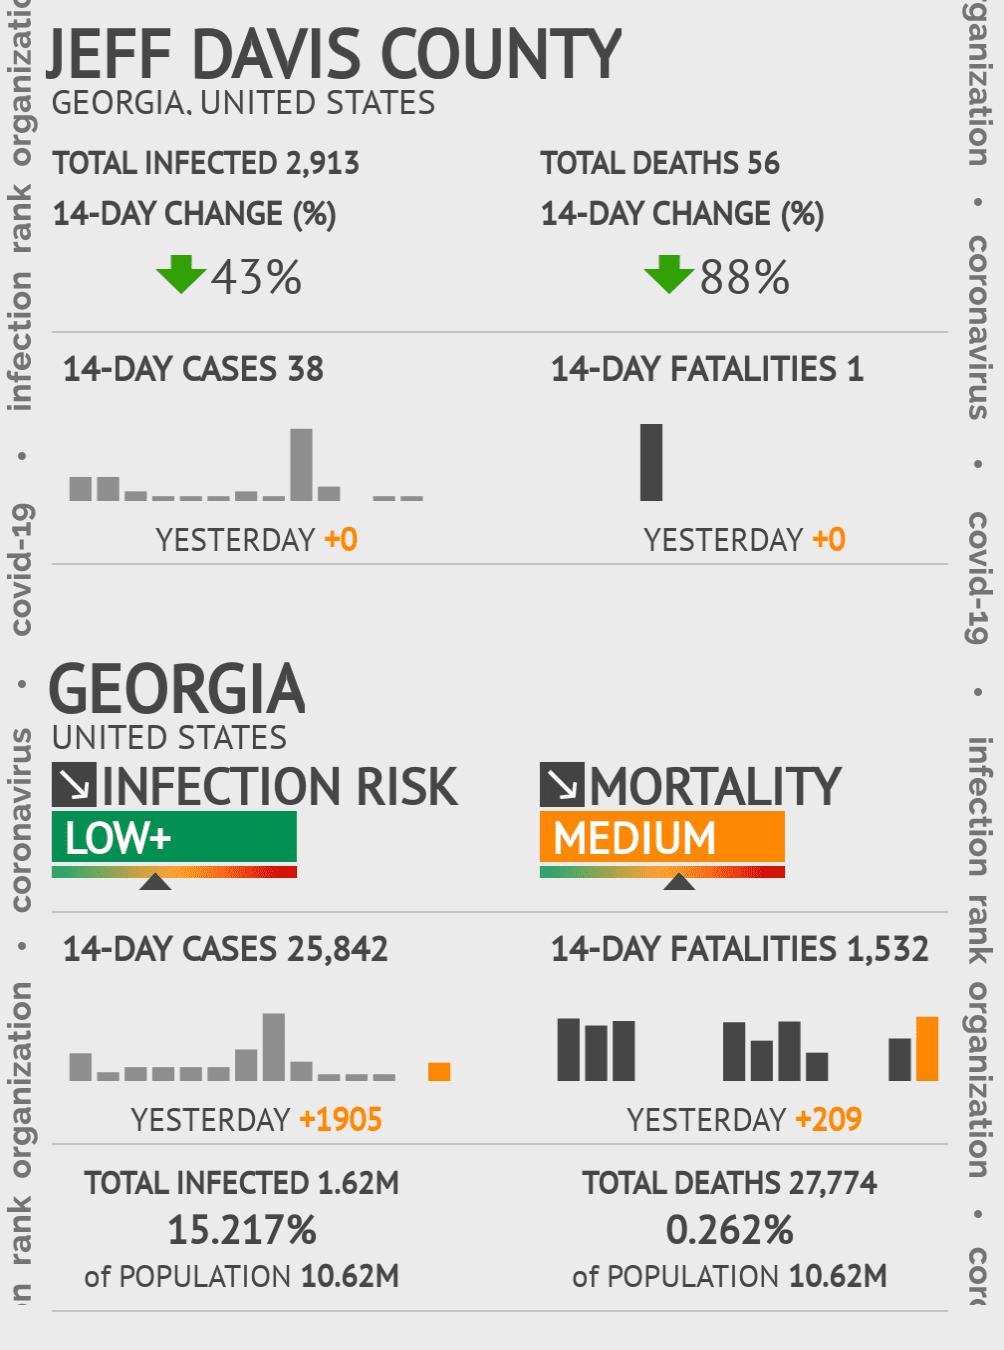 Jeff Davis County Coronavirus Covid-19 Risk of Infection on July 24, 2021